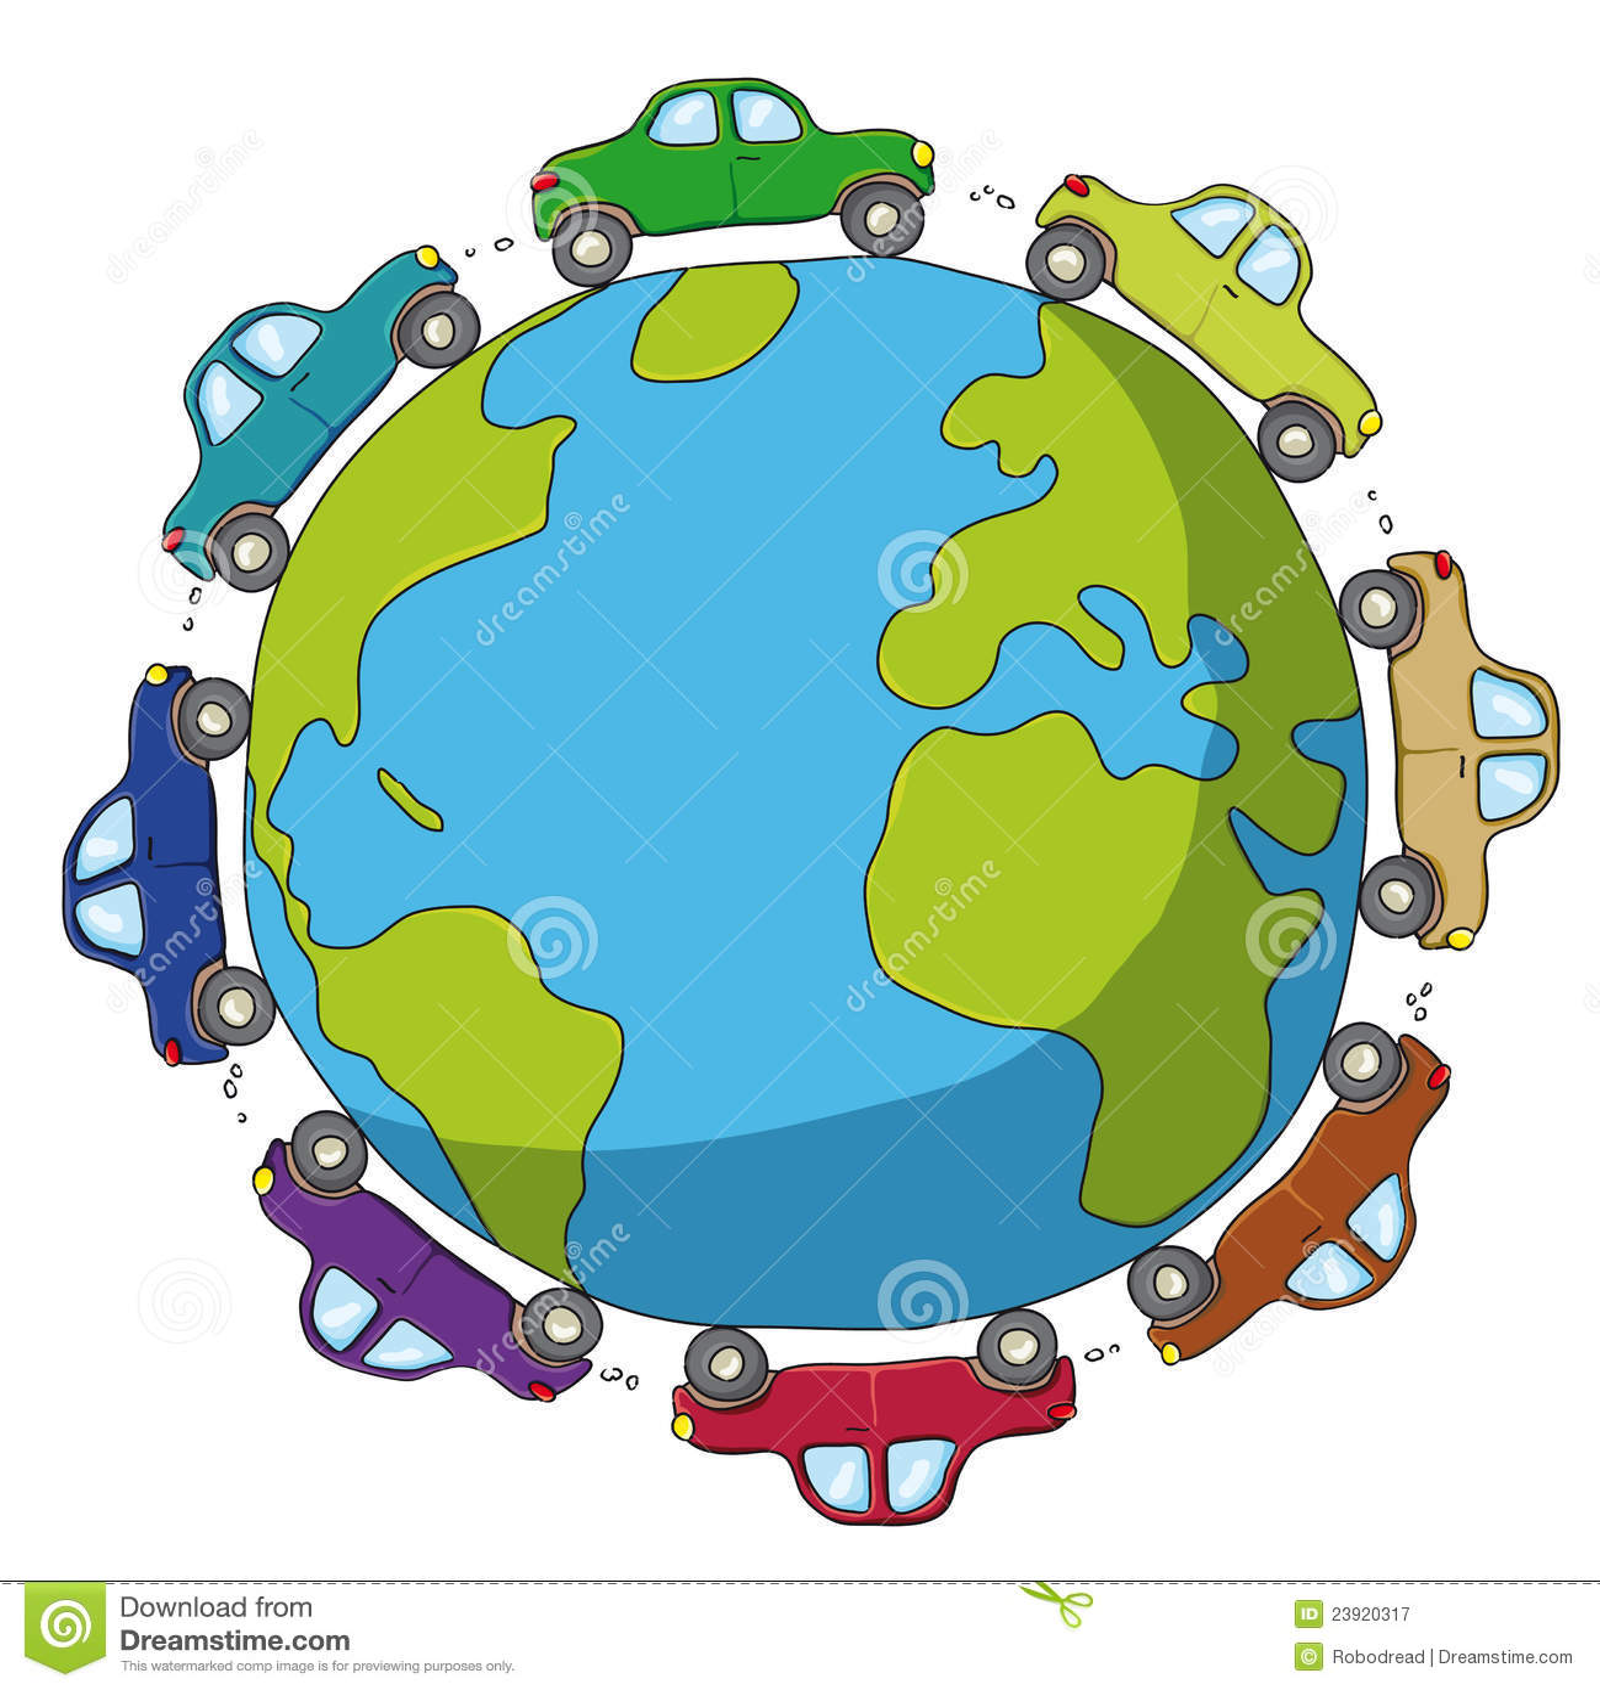 Illustration Of Cars Traveling Around The World